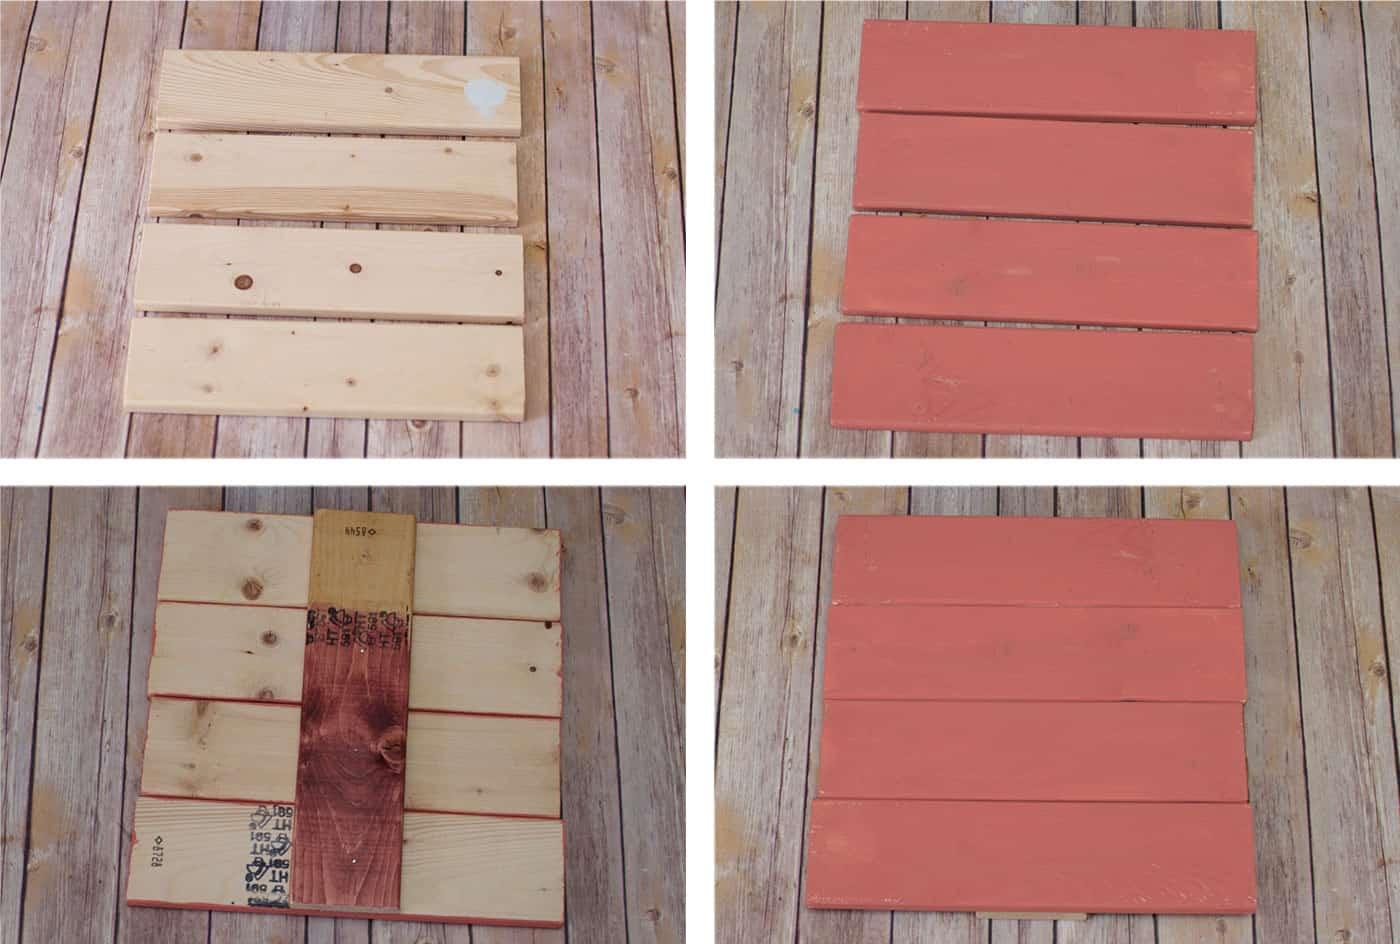 How to put scrapbook paper on wood - Diy Scrapbook Paper Fall Sign